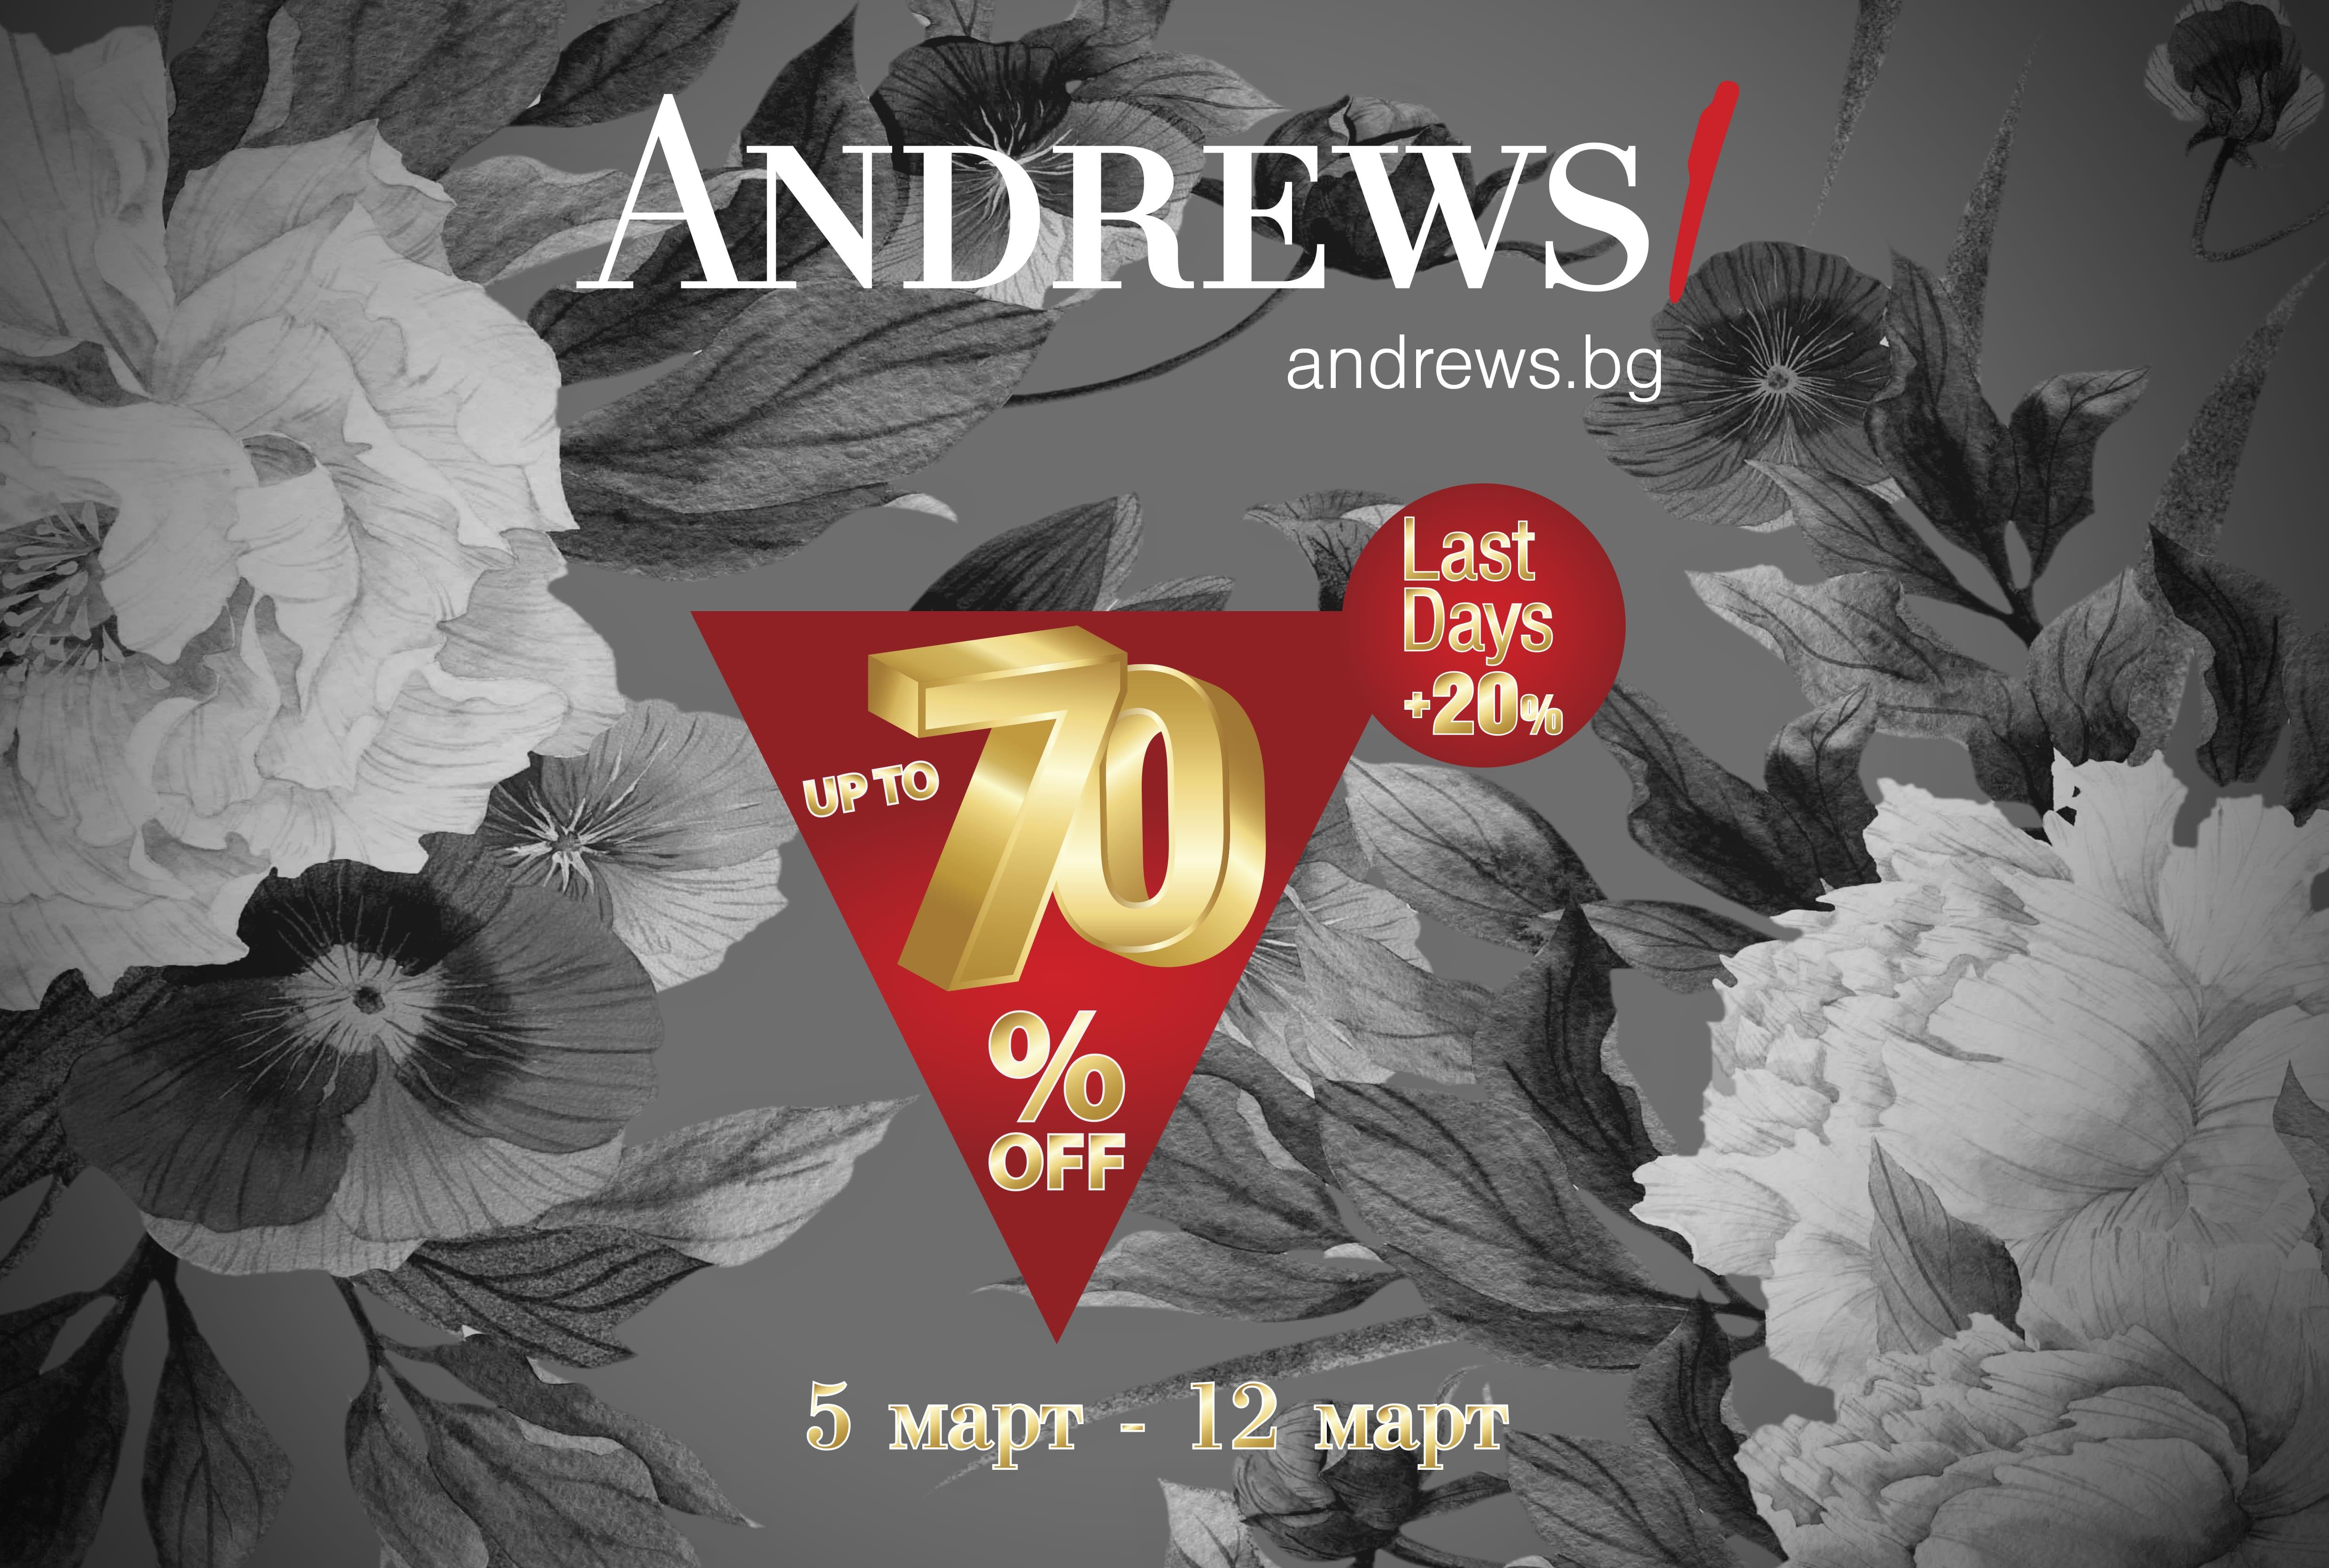 Финални сезонни намаления 70%+20% в Andrews/